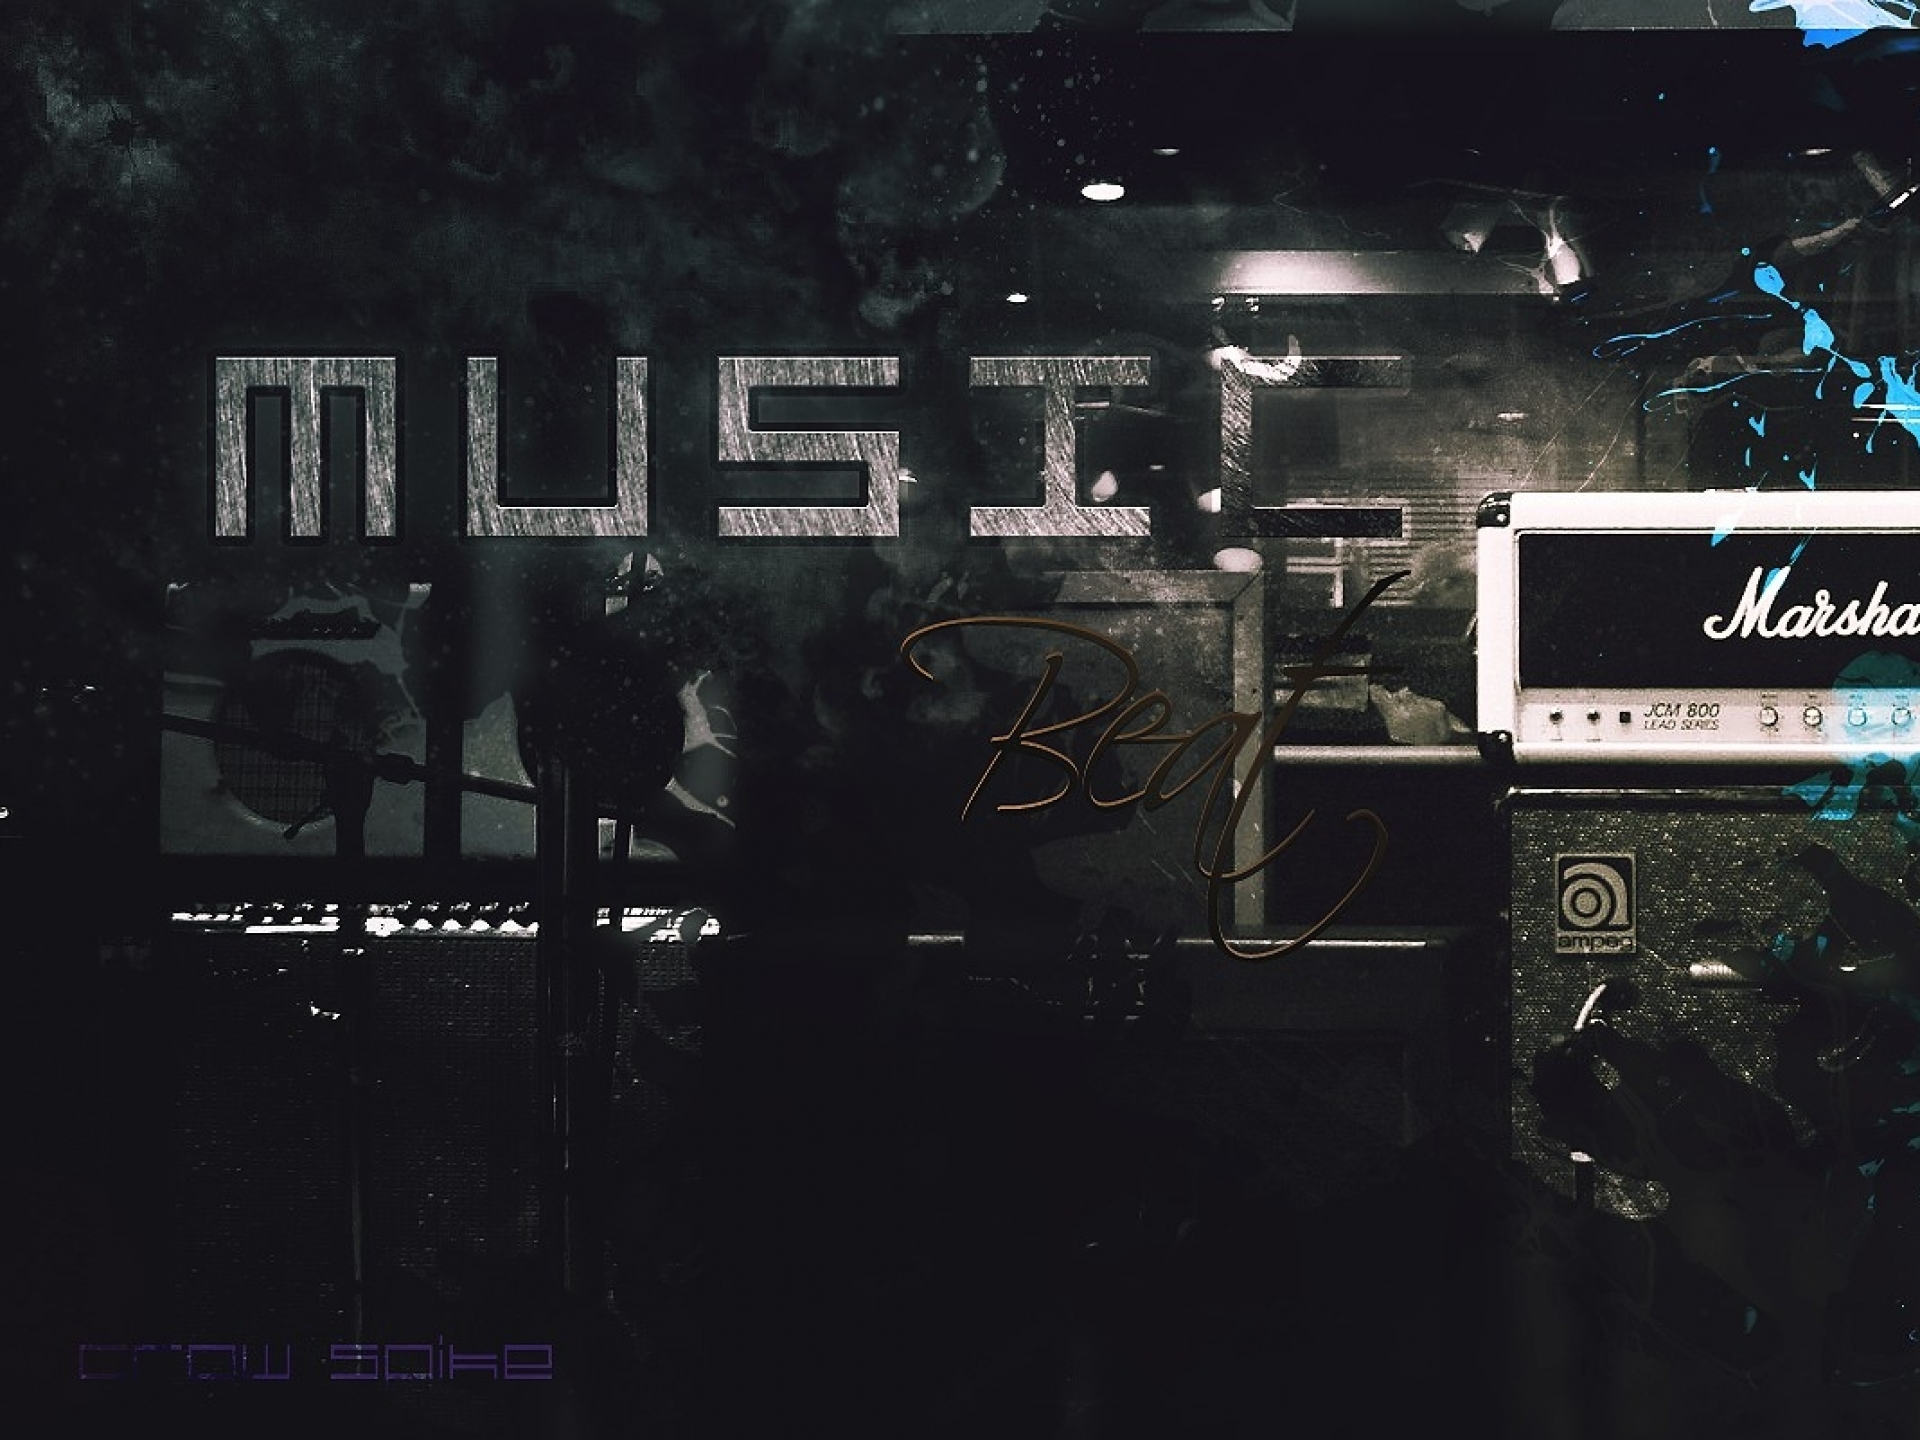 music studio marshall splatter crows microphones photomanipulations 1920x1440